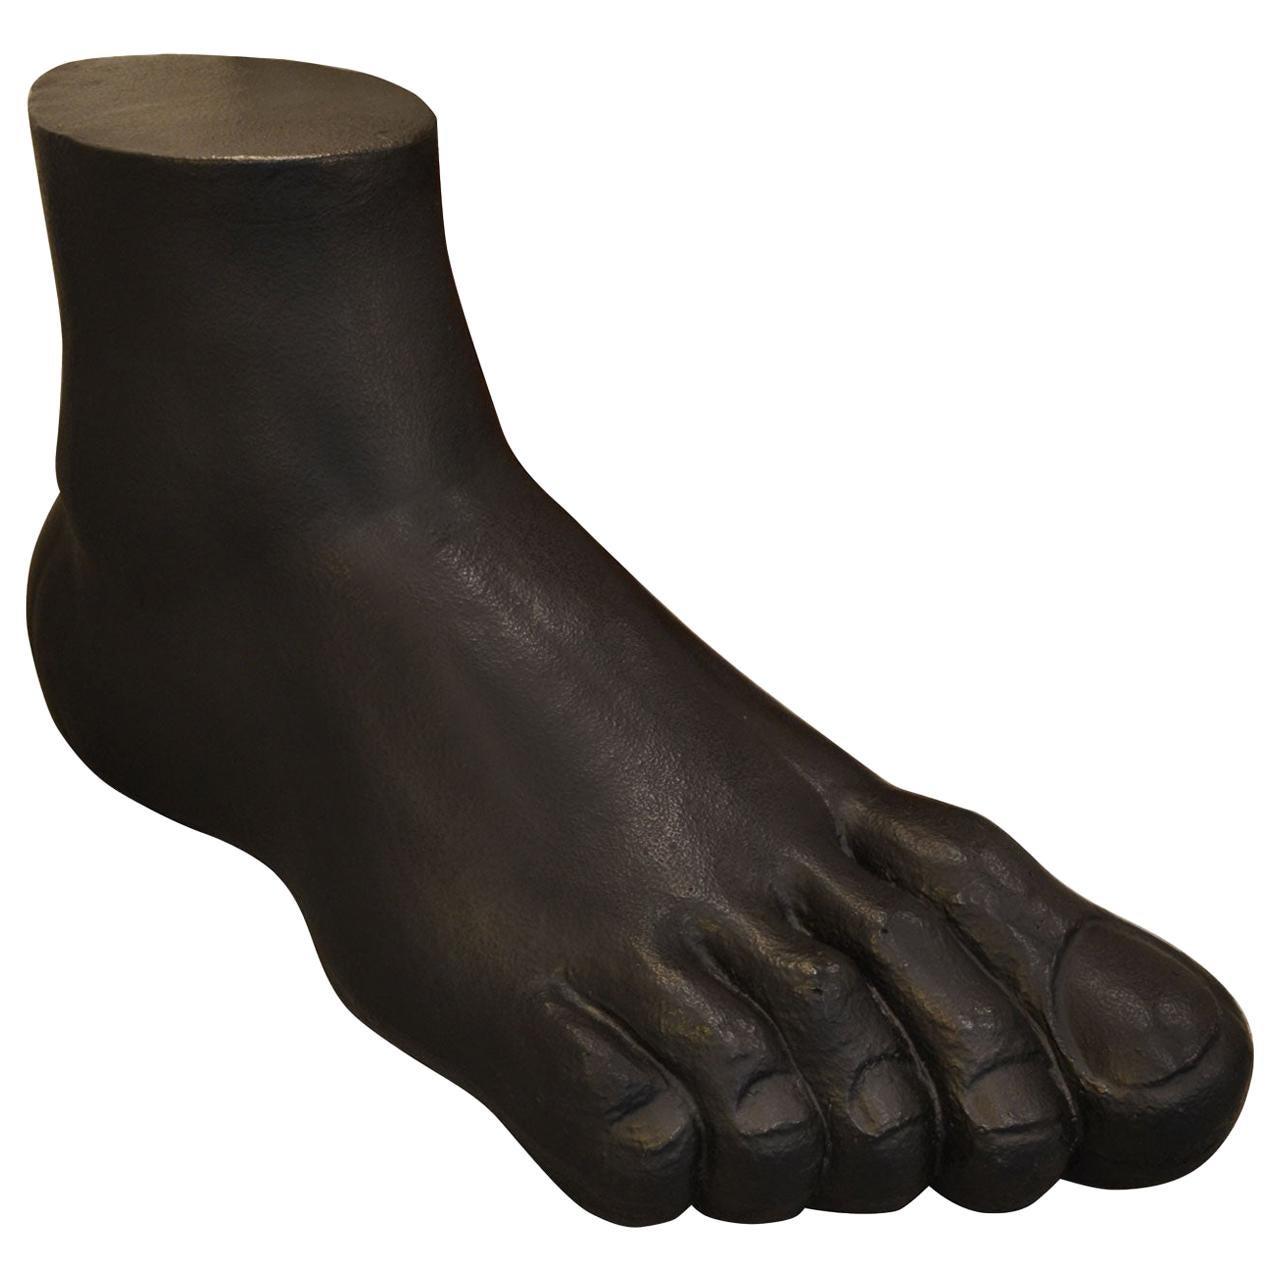 20th Century Gaetano Pesce UP7 Foot-Shaped in Polyurethane Foam for B&B Italia